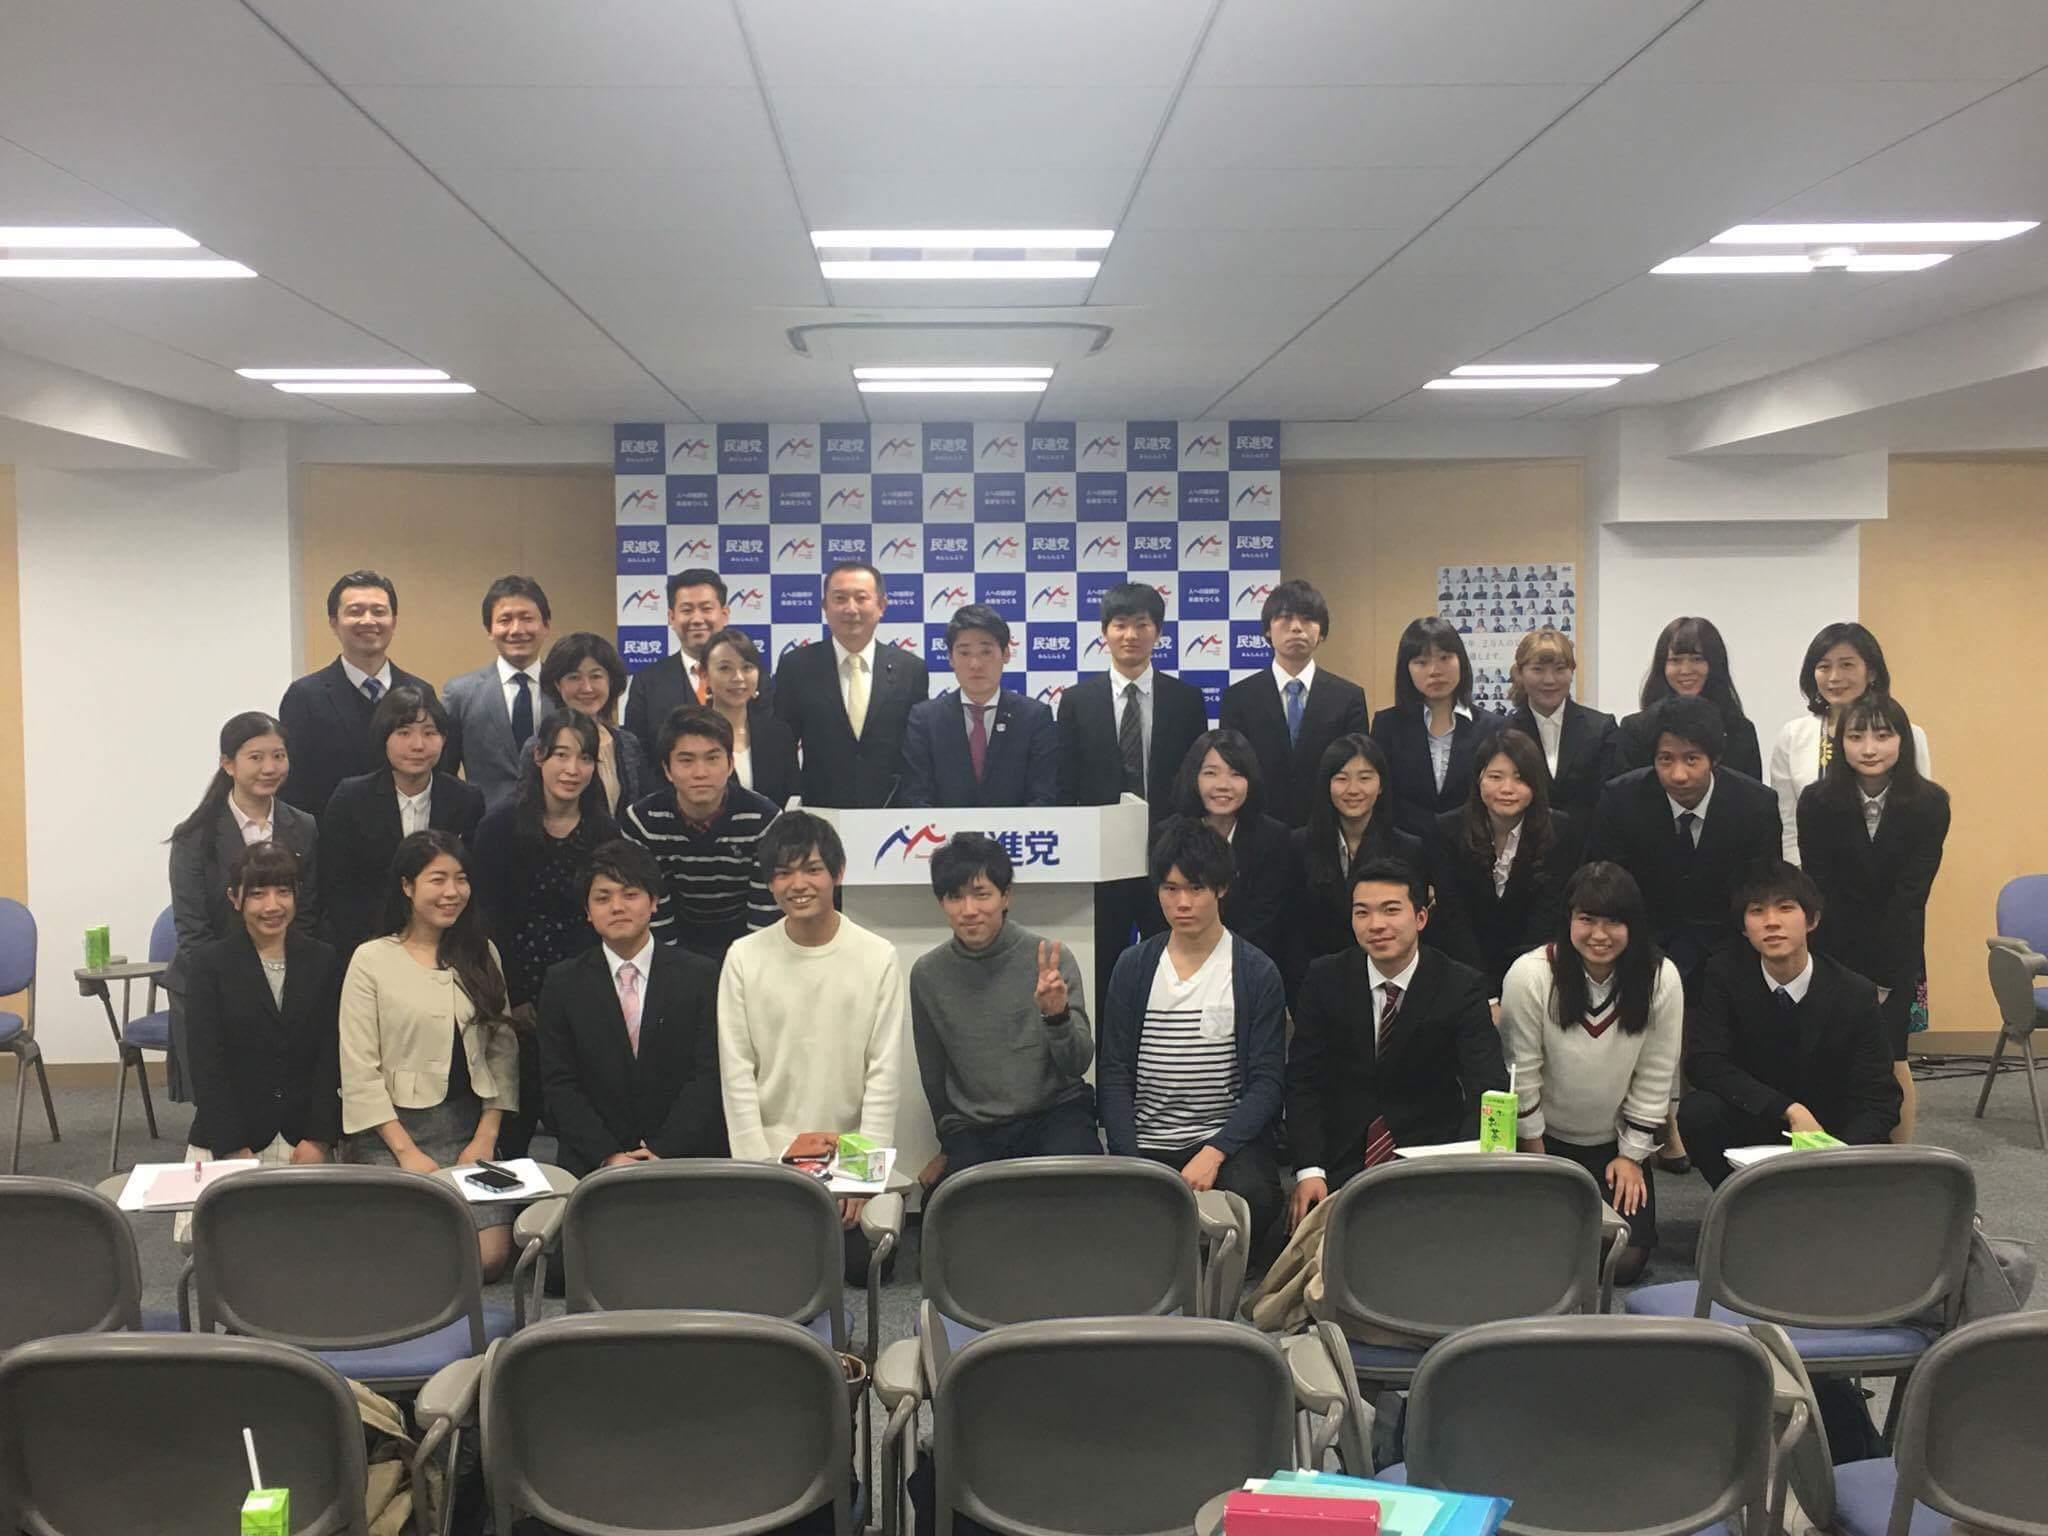 給田小学校卒業式 インターン政策発表会_c0092197_23413989.jpeg